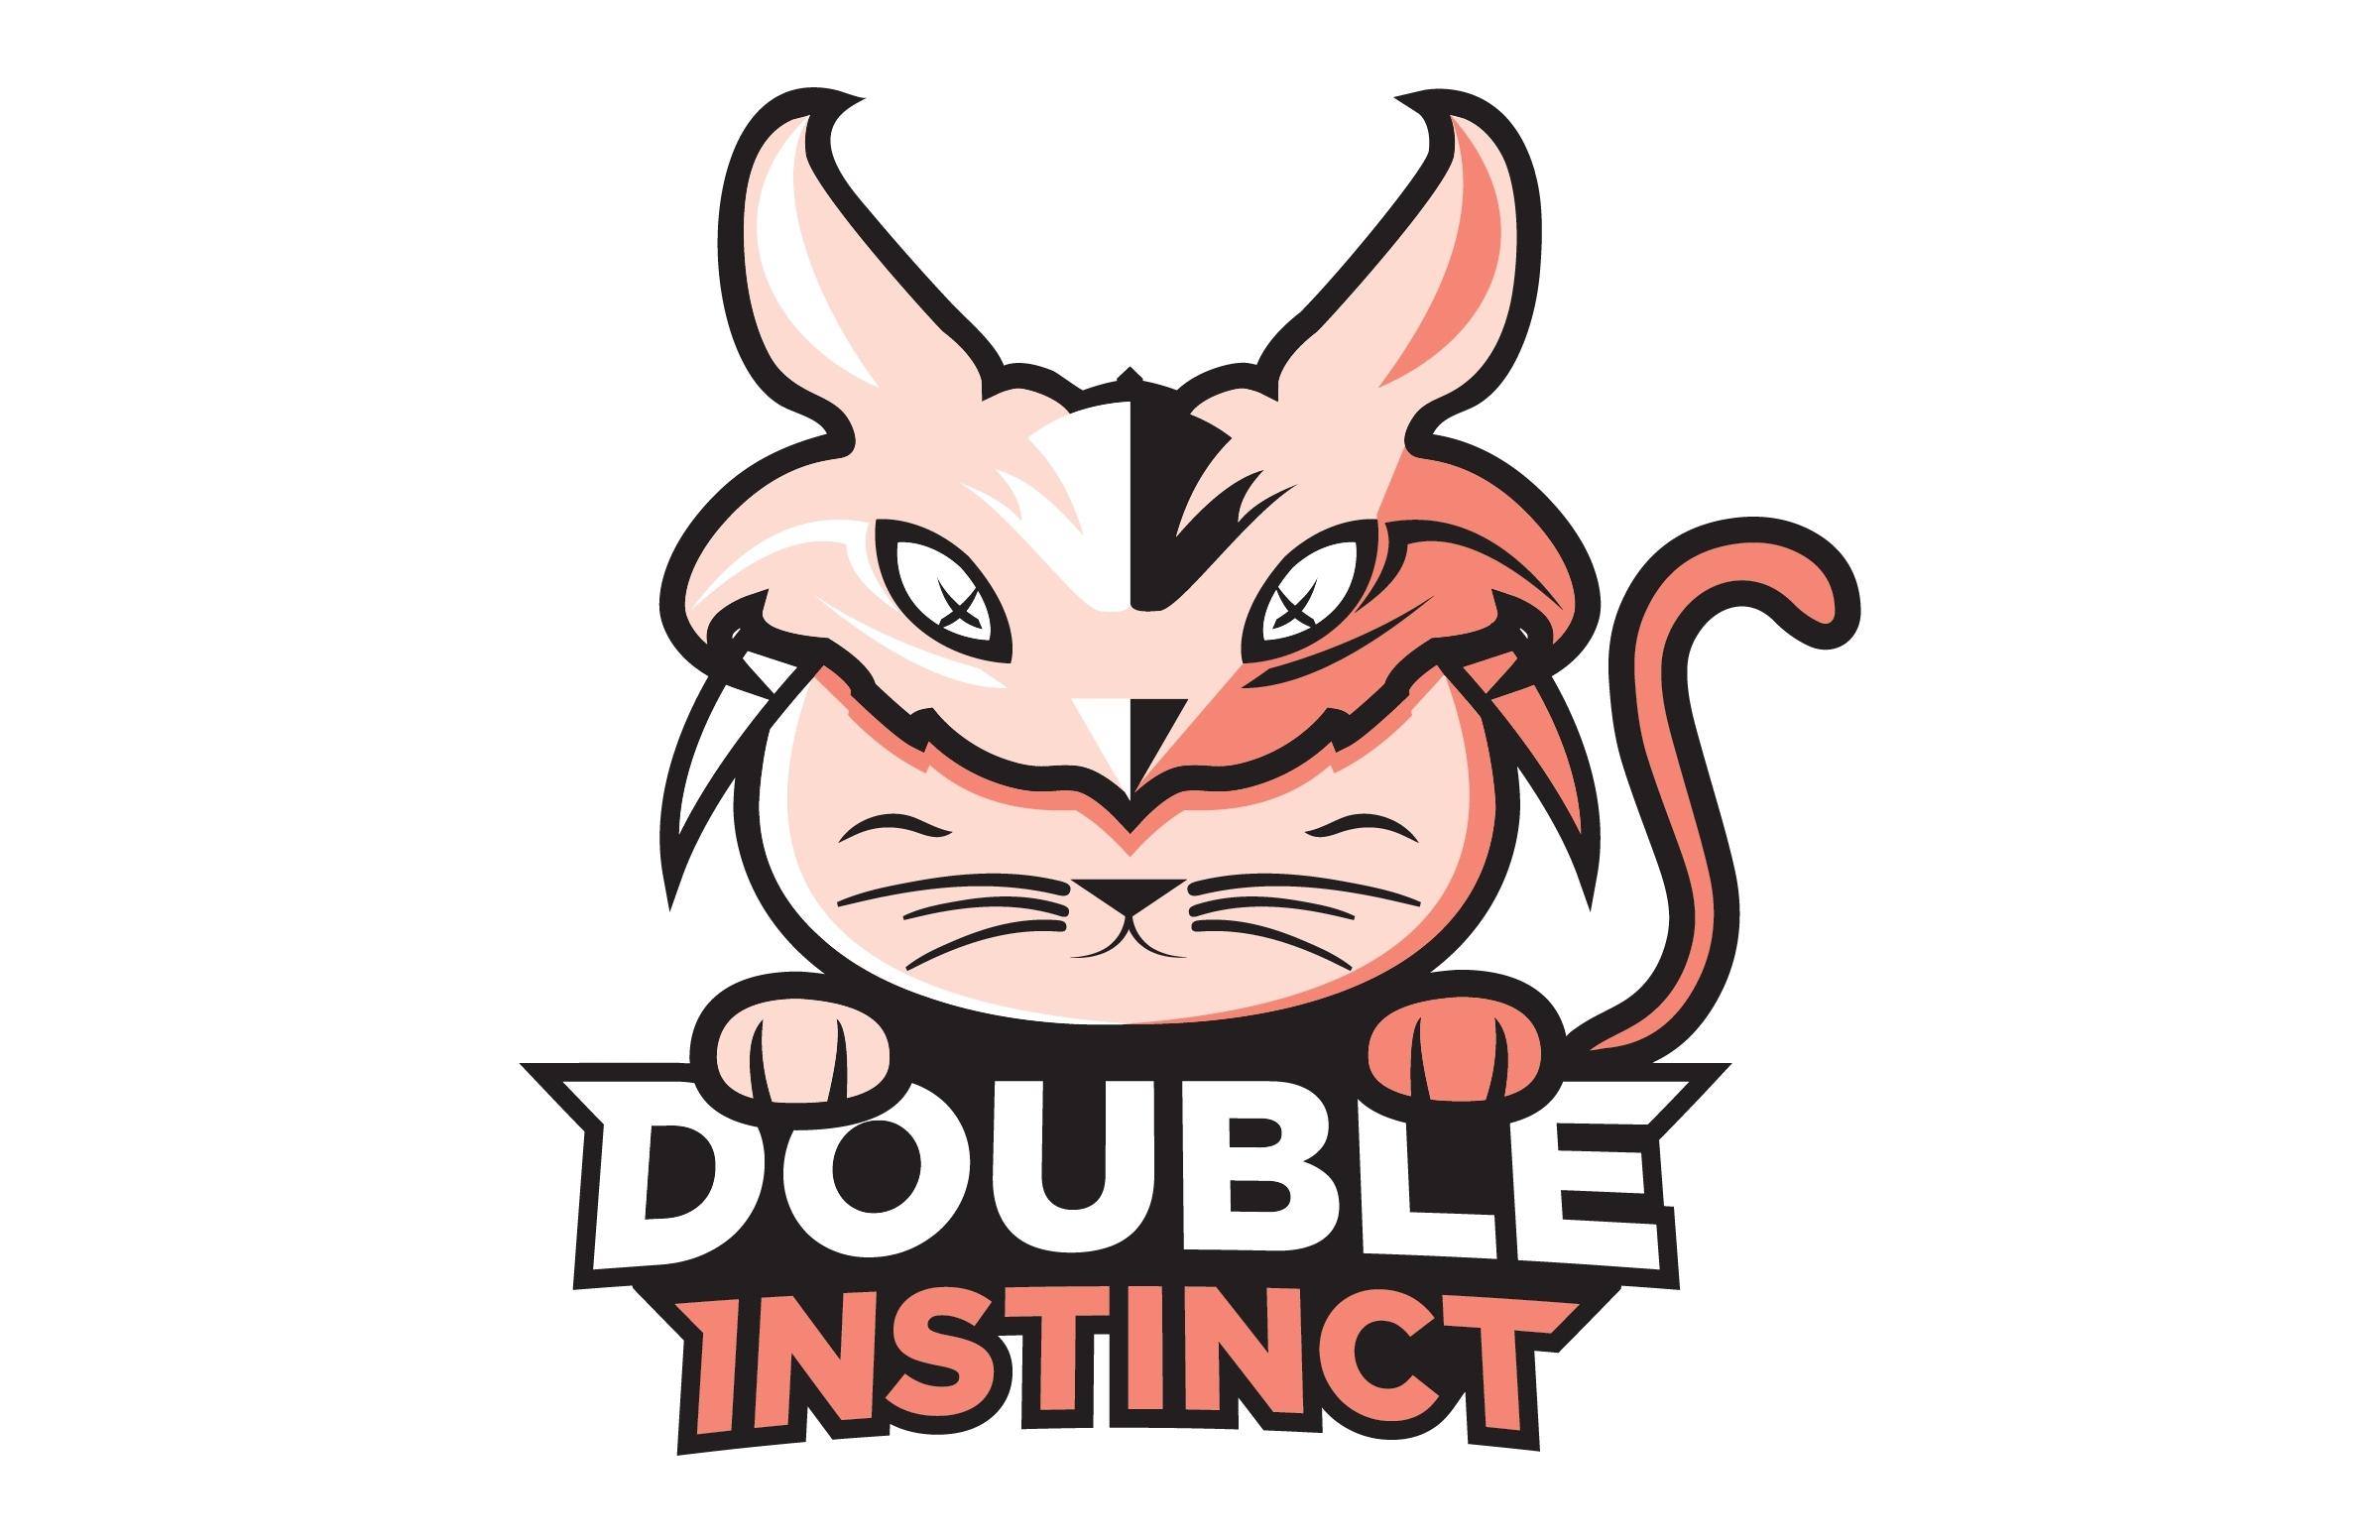 Double Instinct-01.jpg